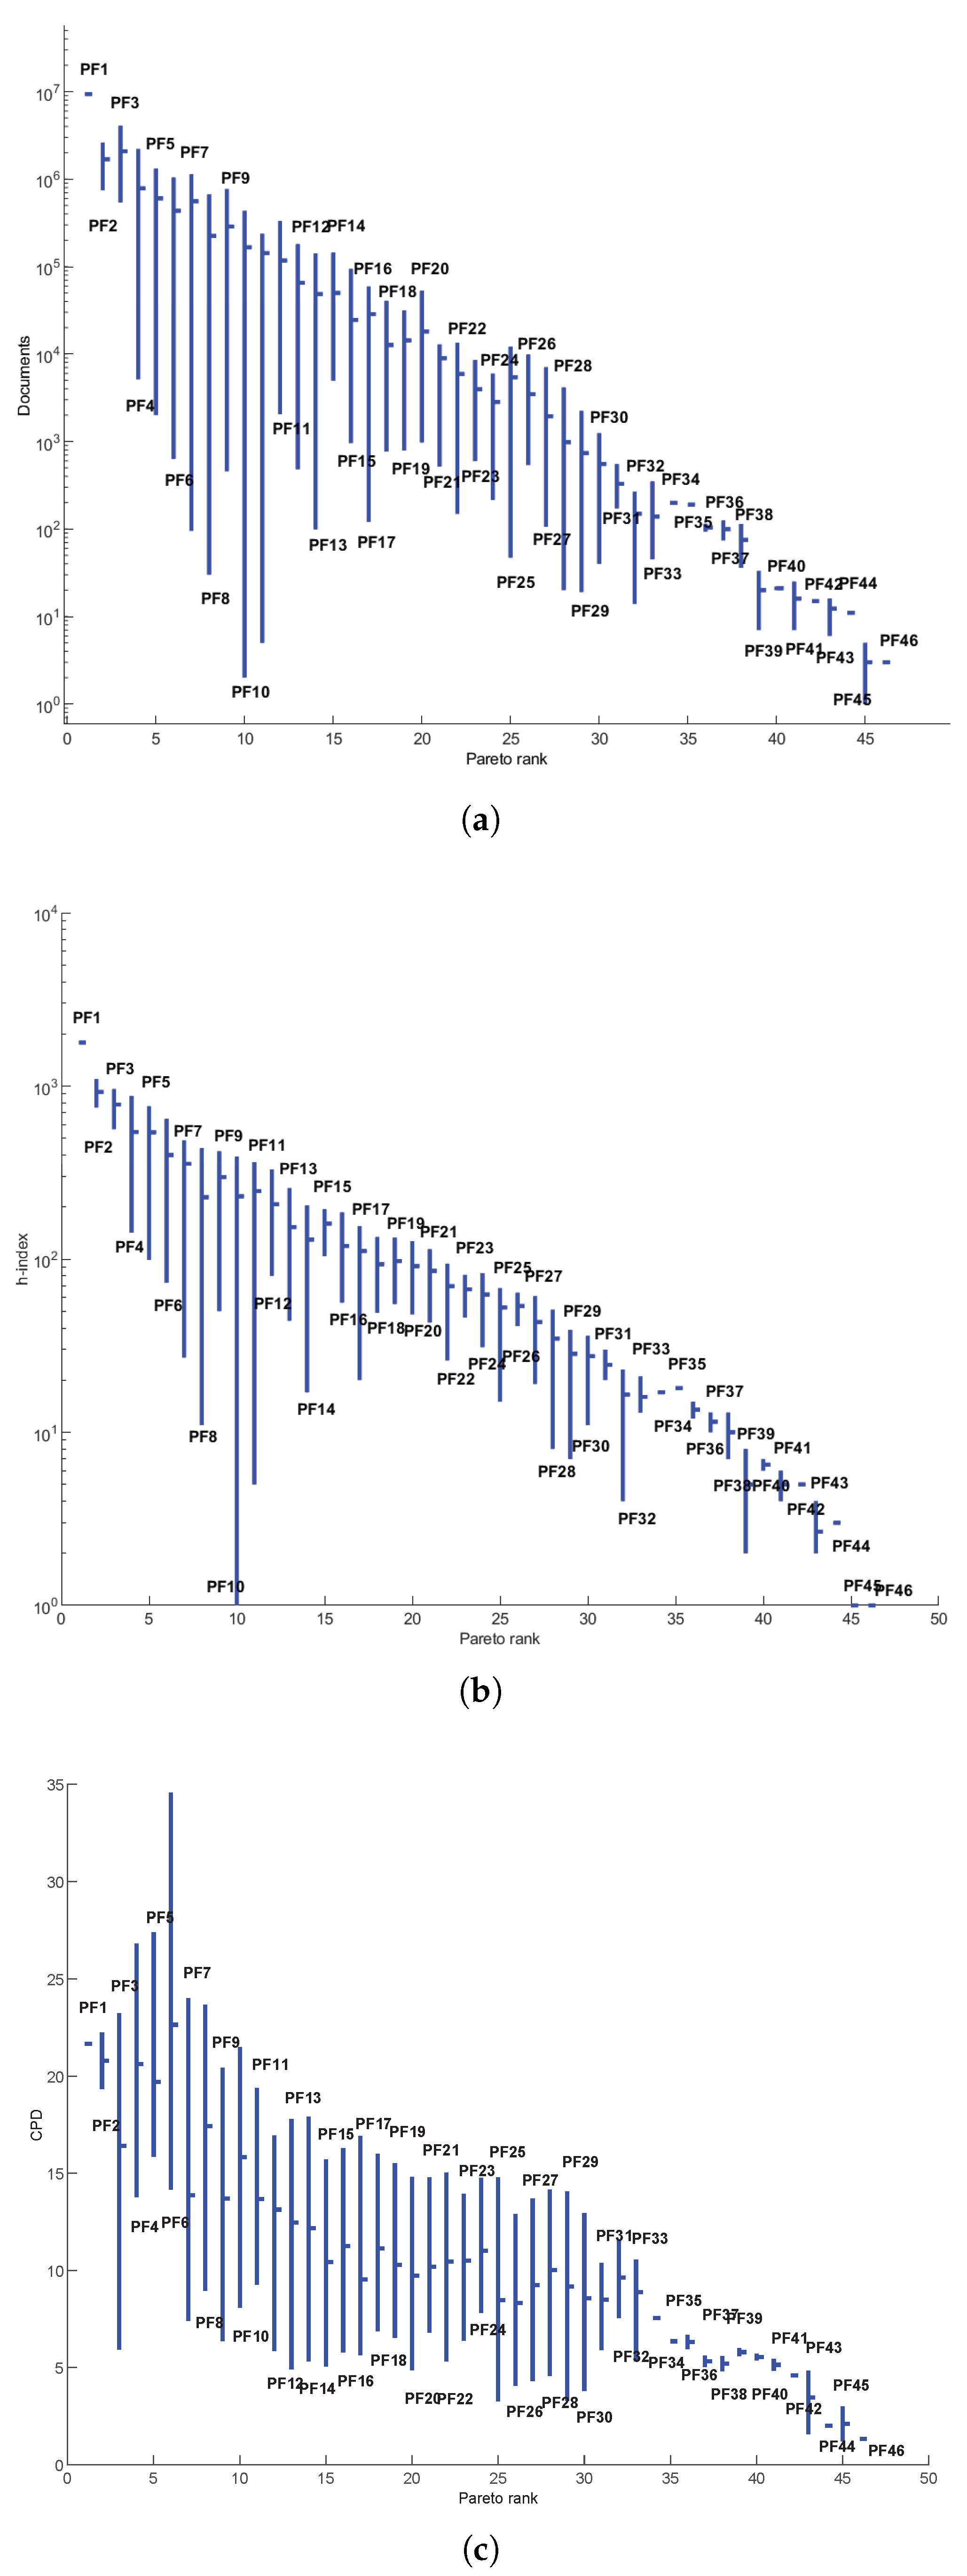 Mathematics Free Full Text Ranking Multi Metric Scientific Achievements Using A Concept Of Pareto Optimality Html